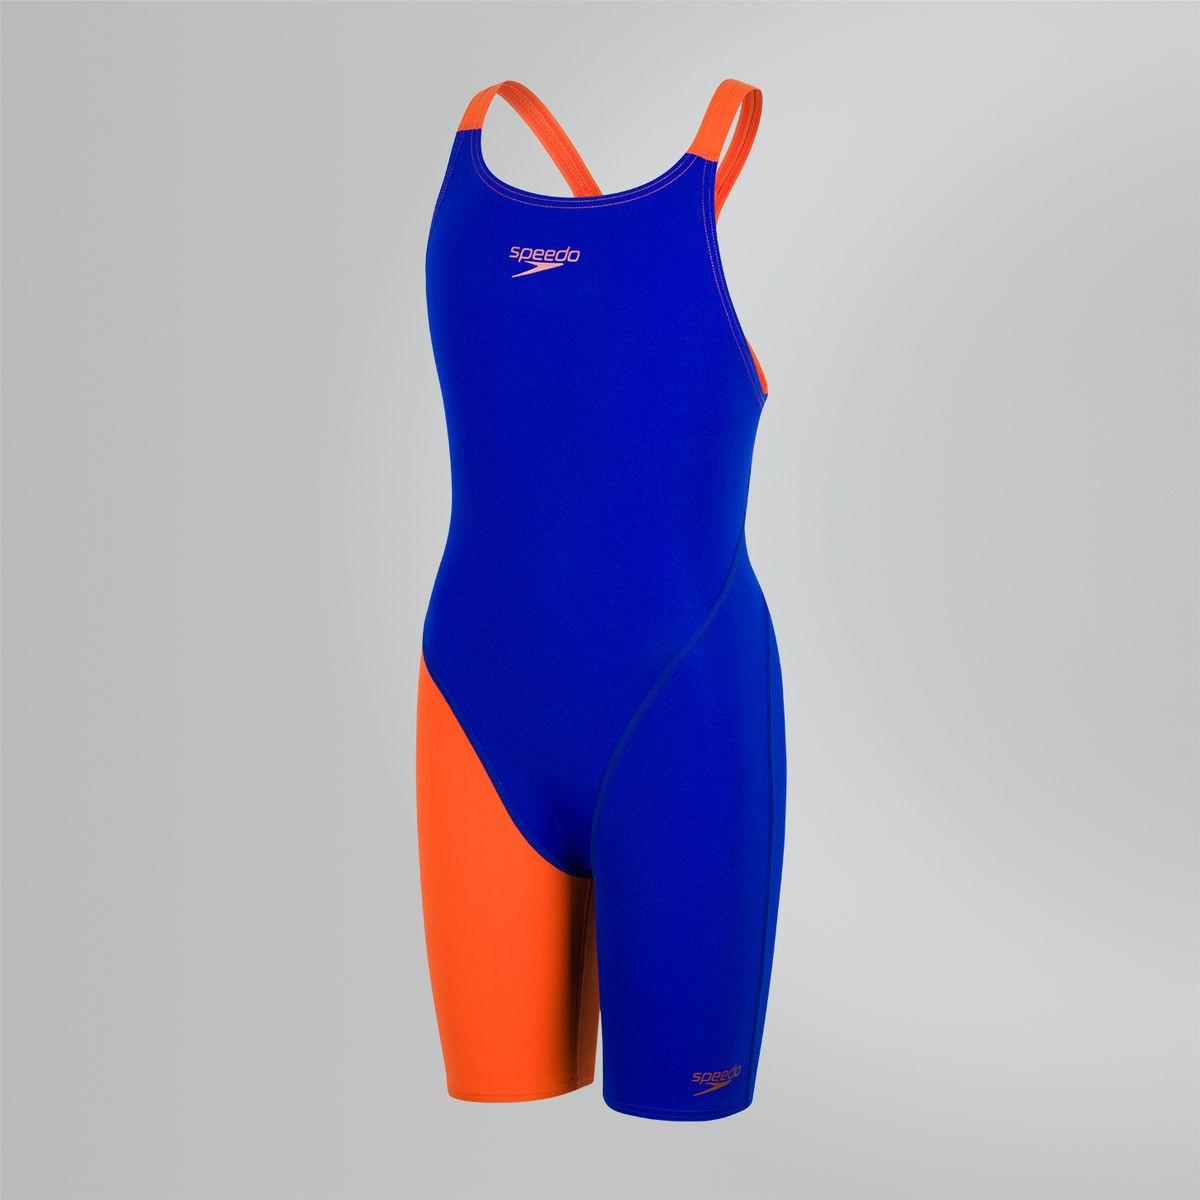 Speedo meisjes wedstrijdbadpak oranje-blauw